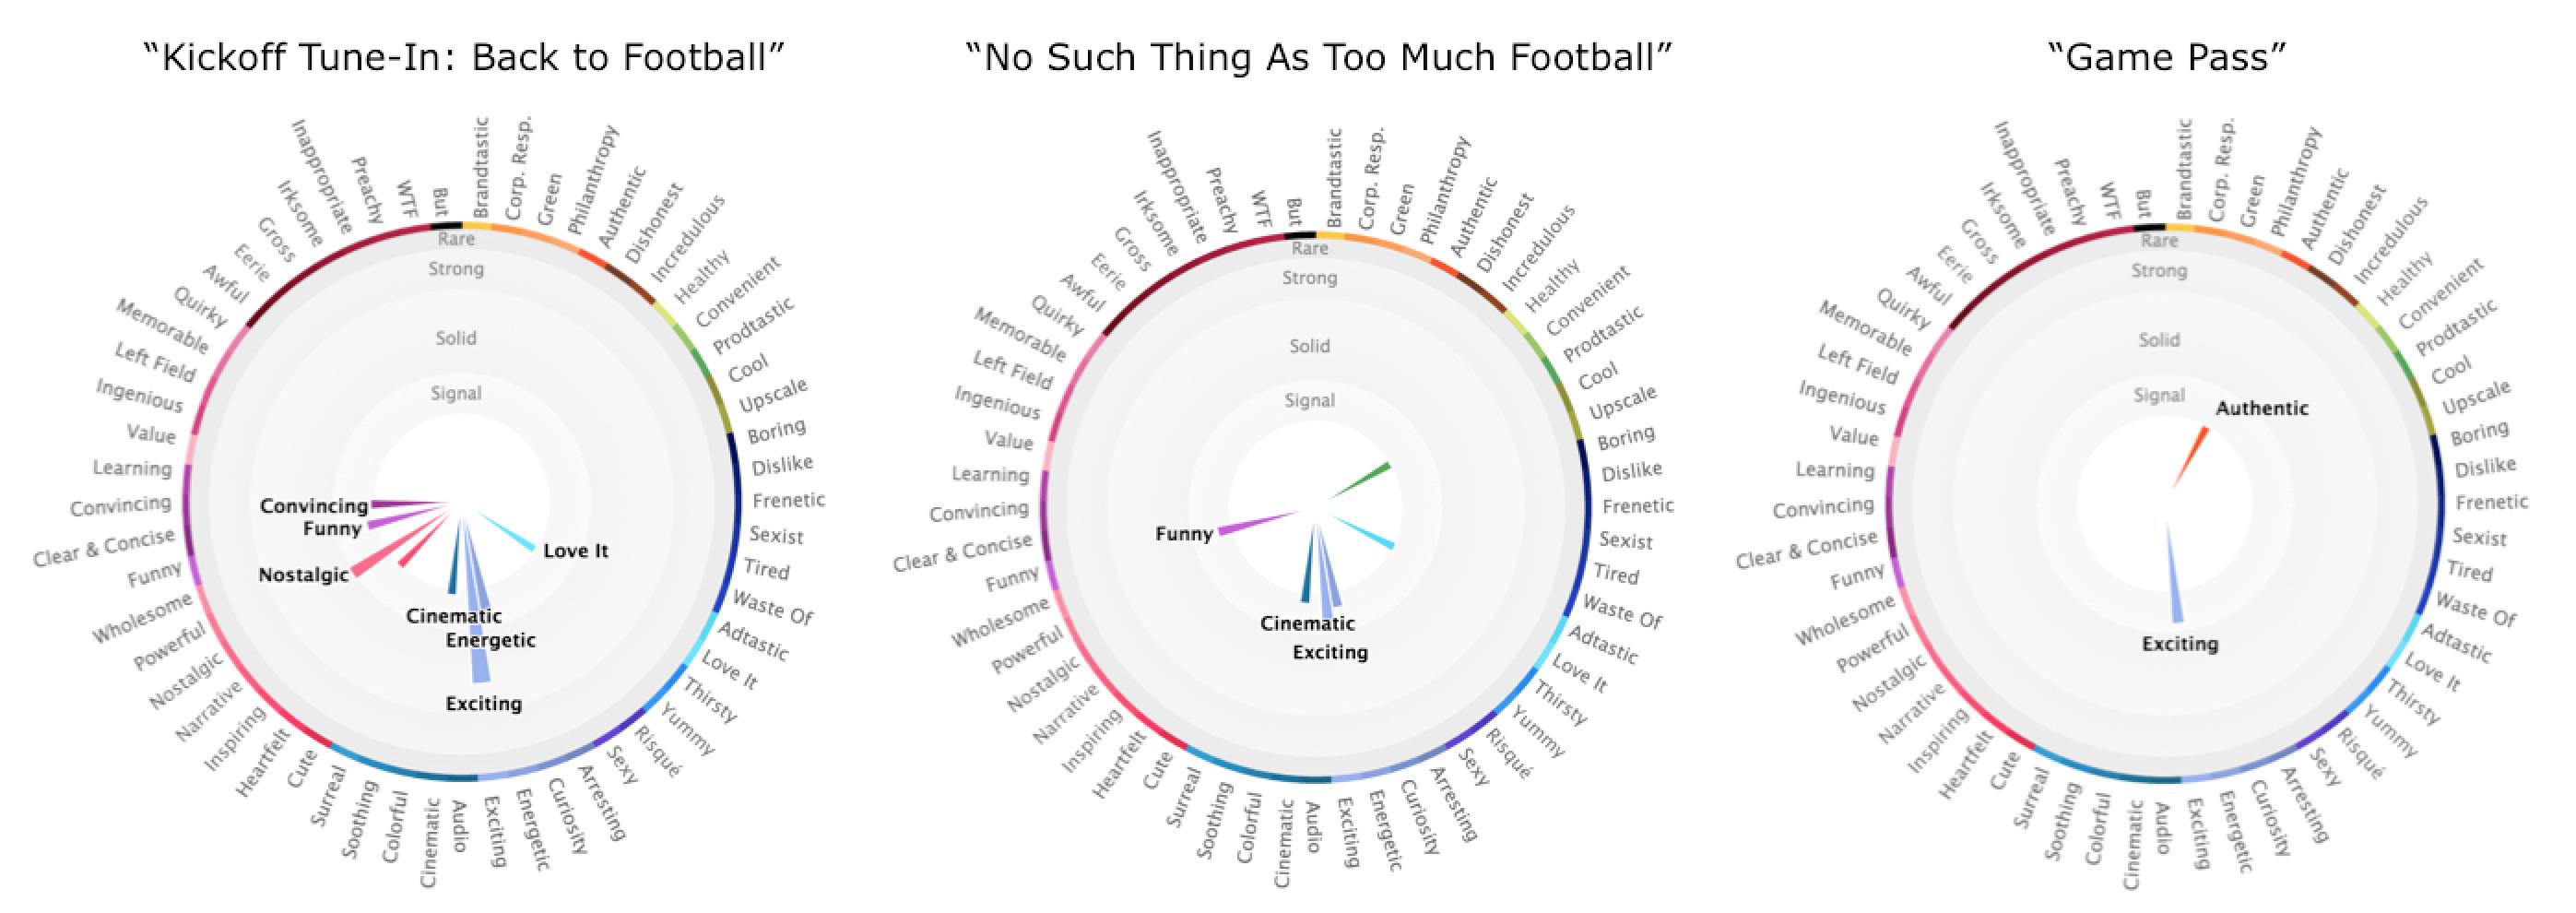 Emotional Profiles for 3 NFL Ads